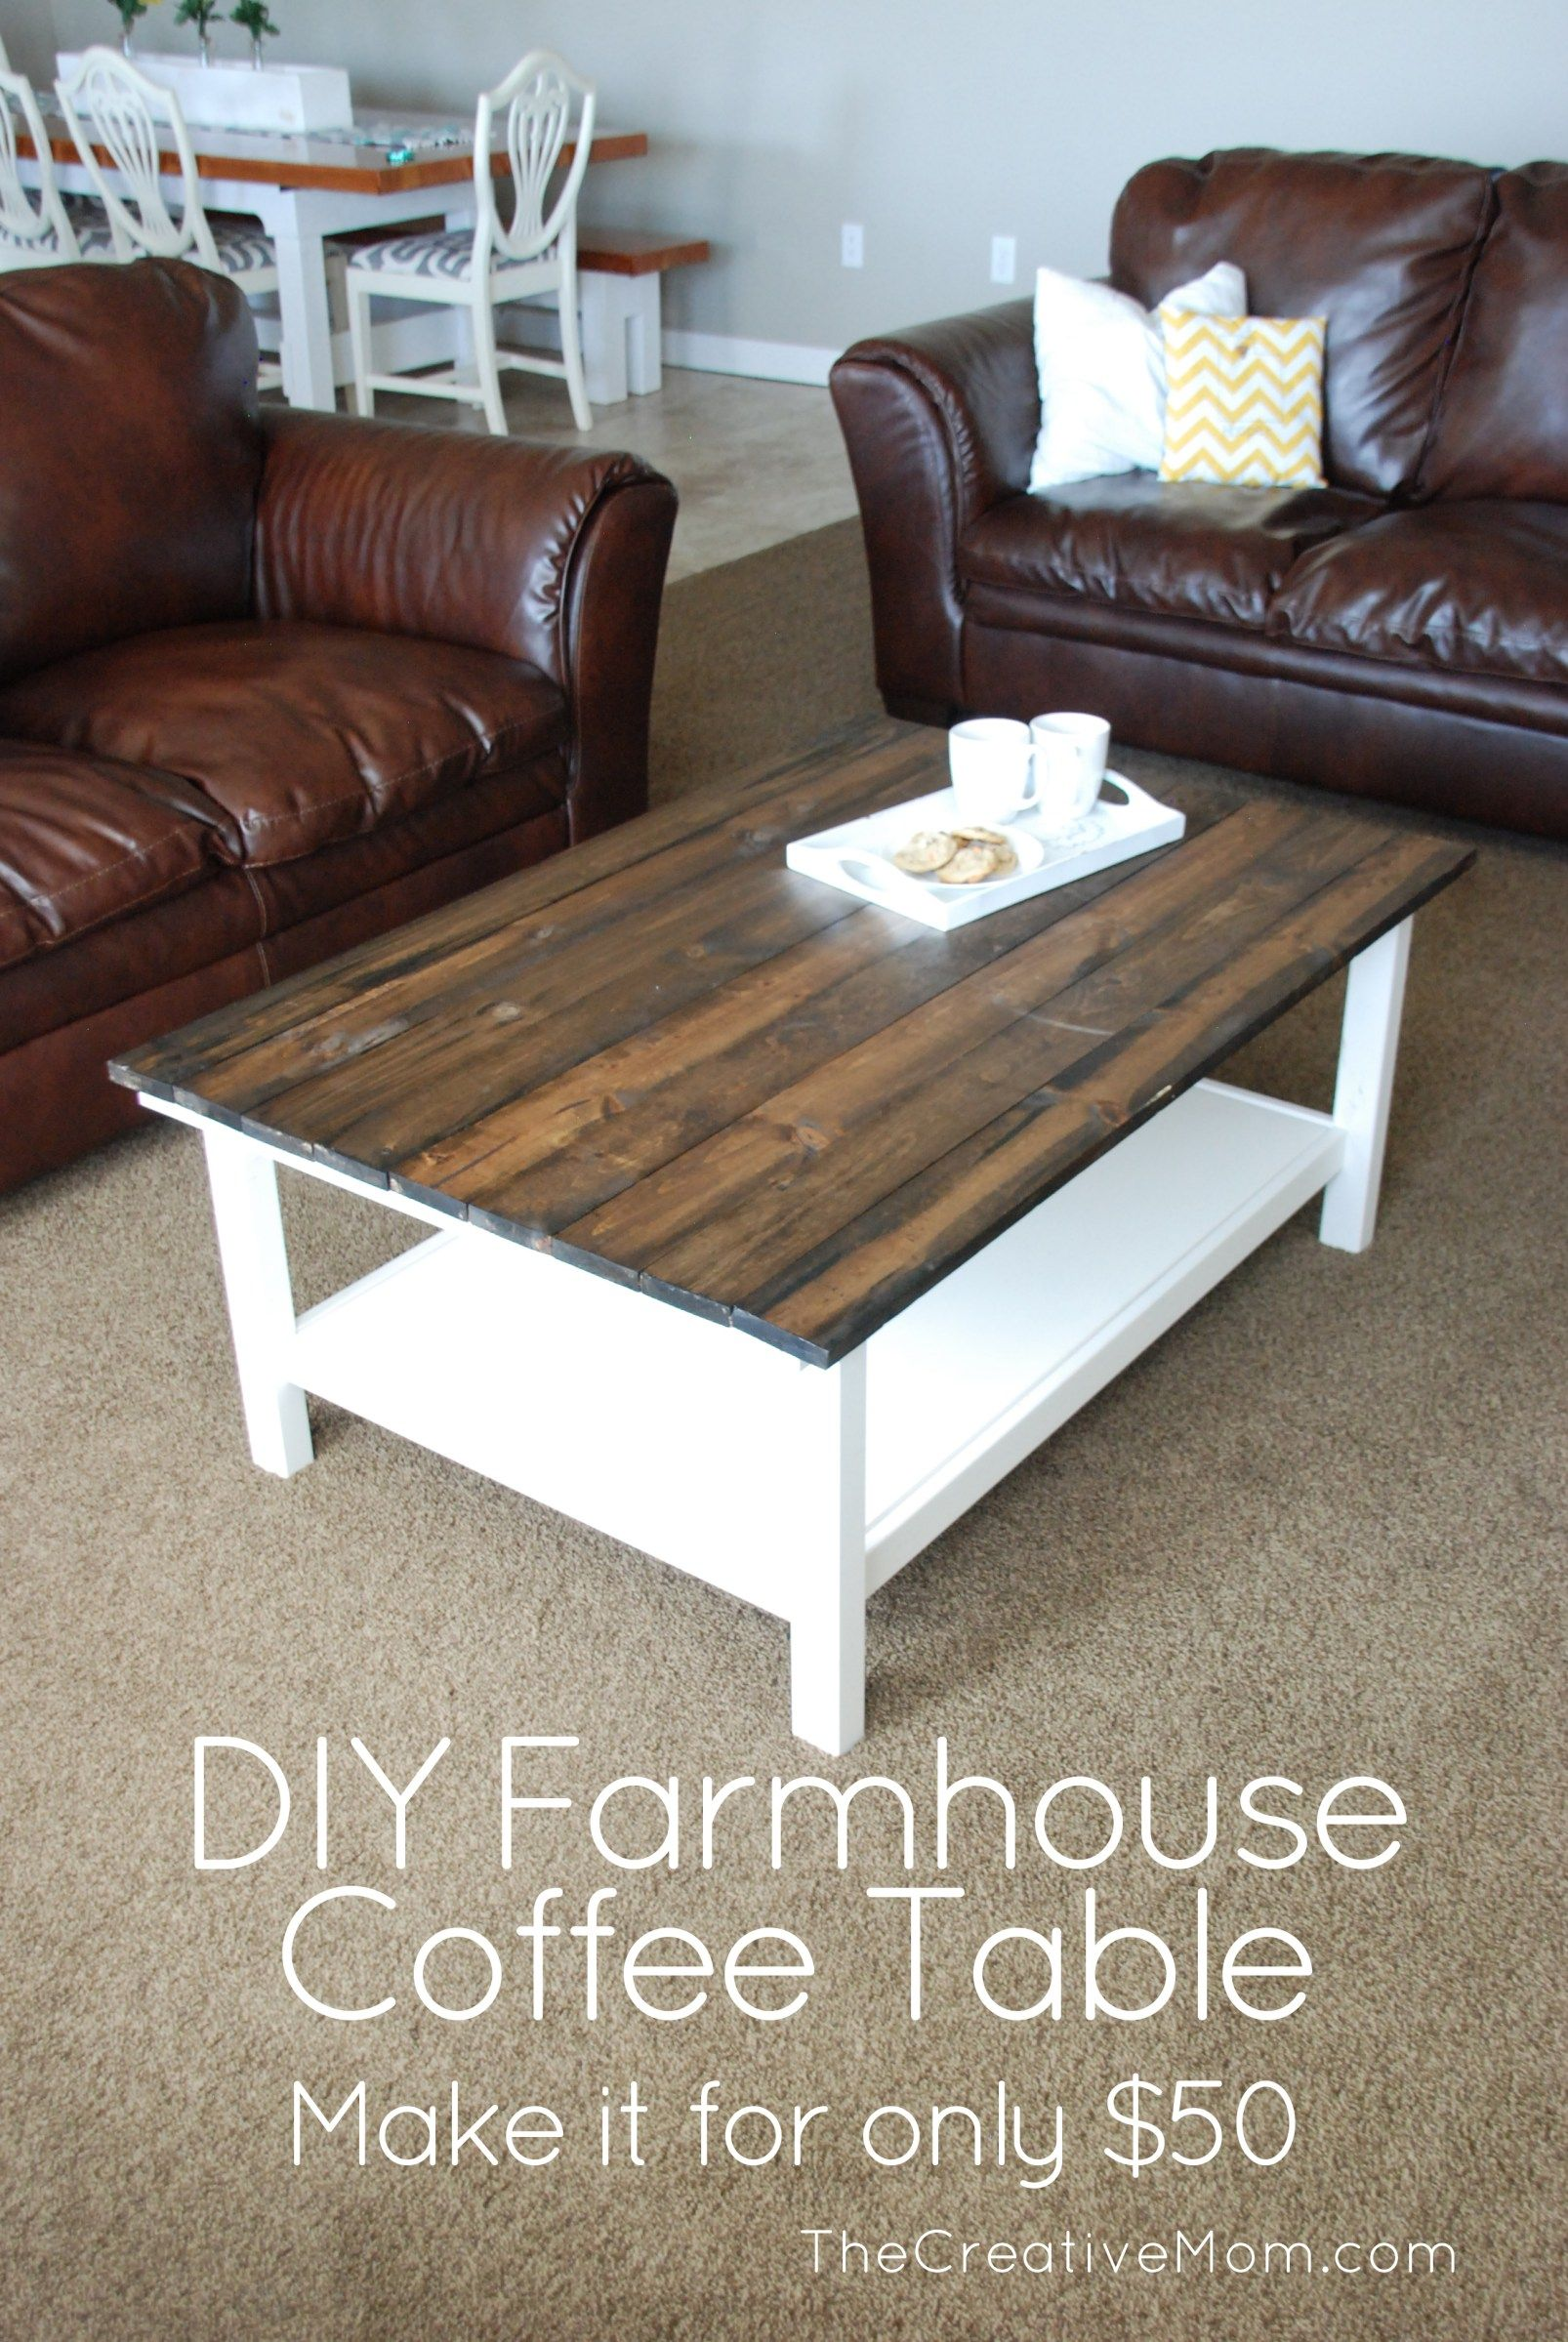 Diy farmhouse coffee table ikea hack coffee table ikea